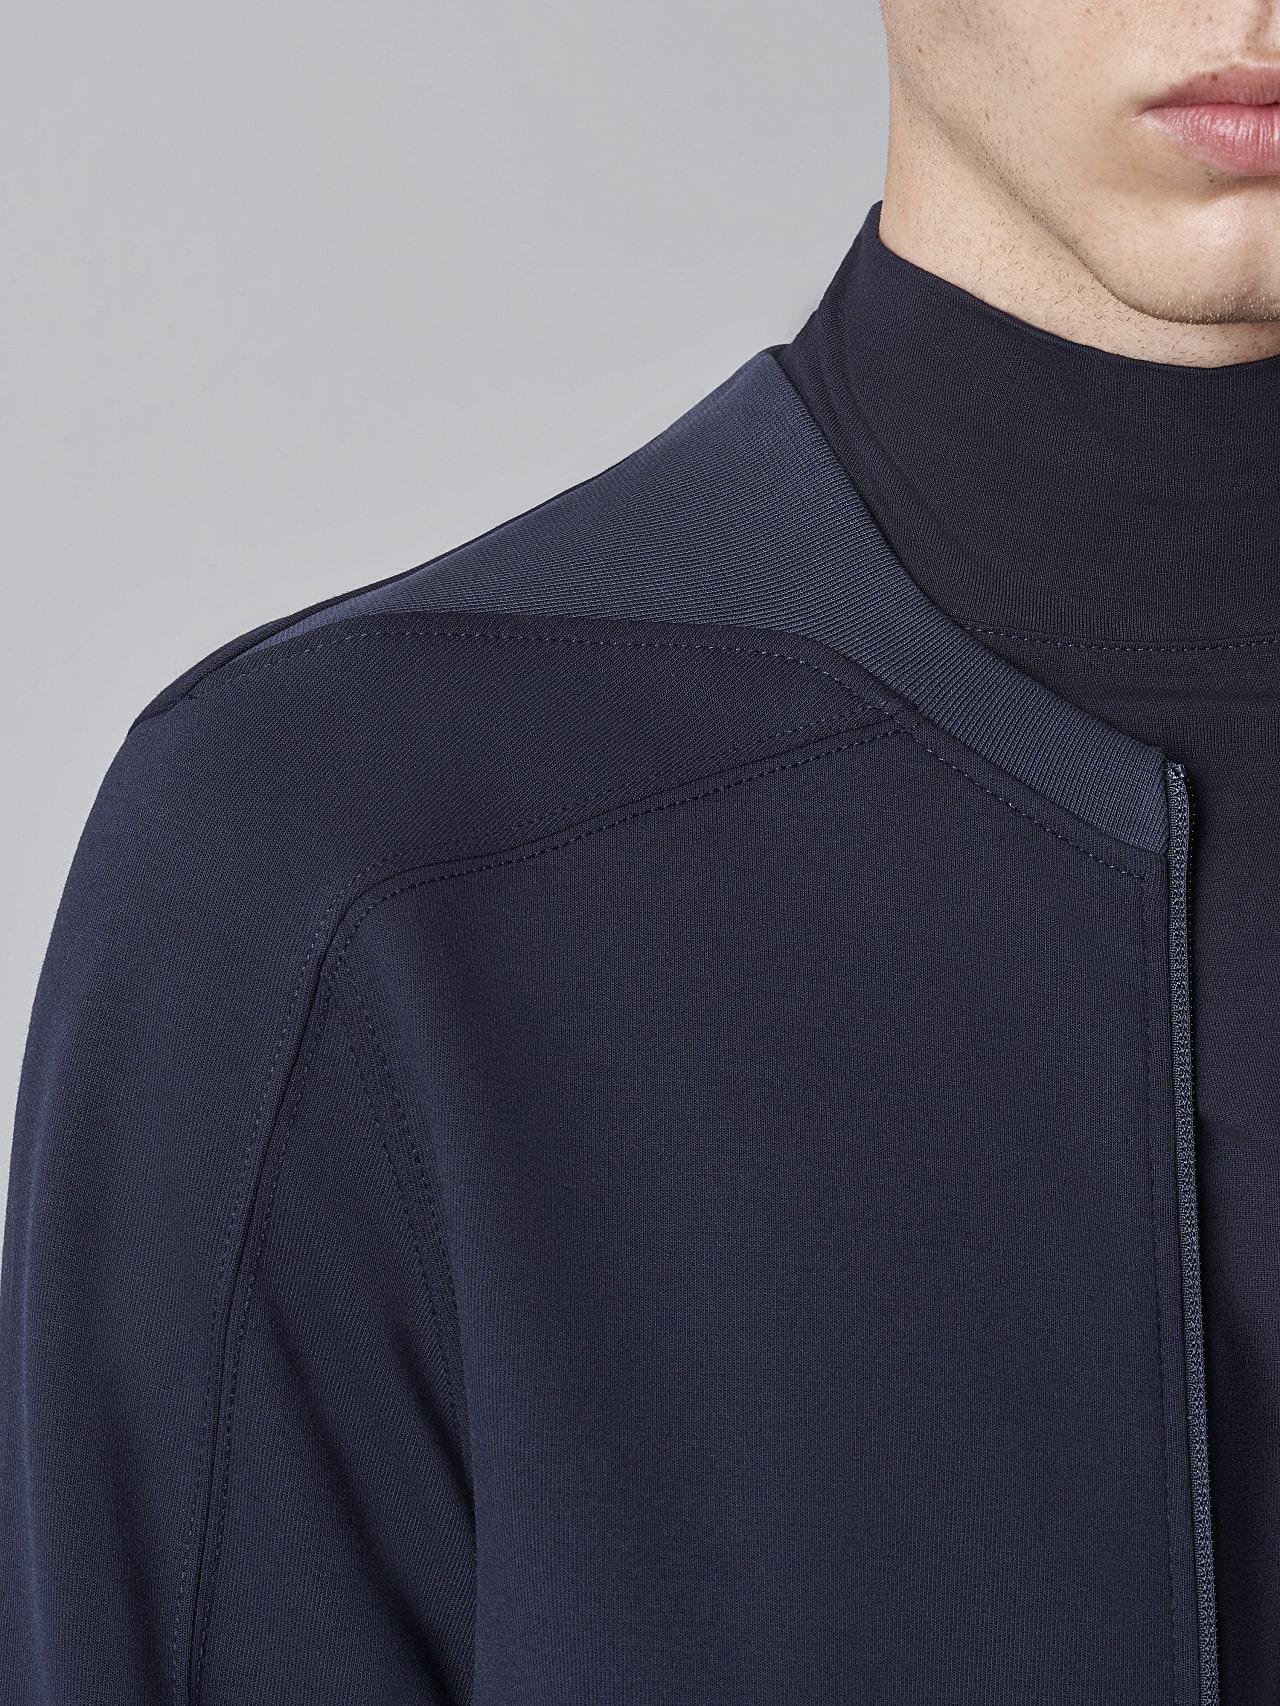 SCOJA V4.Y5.02 Premium Sweat Zip-Jacket navy Right Alpha Tauri